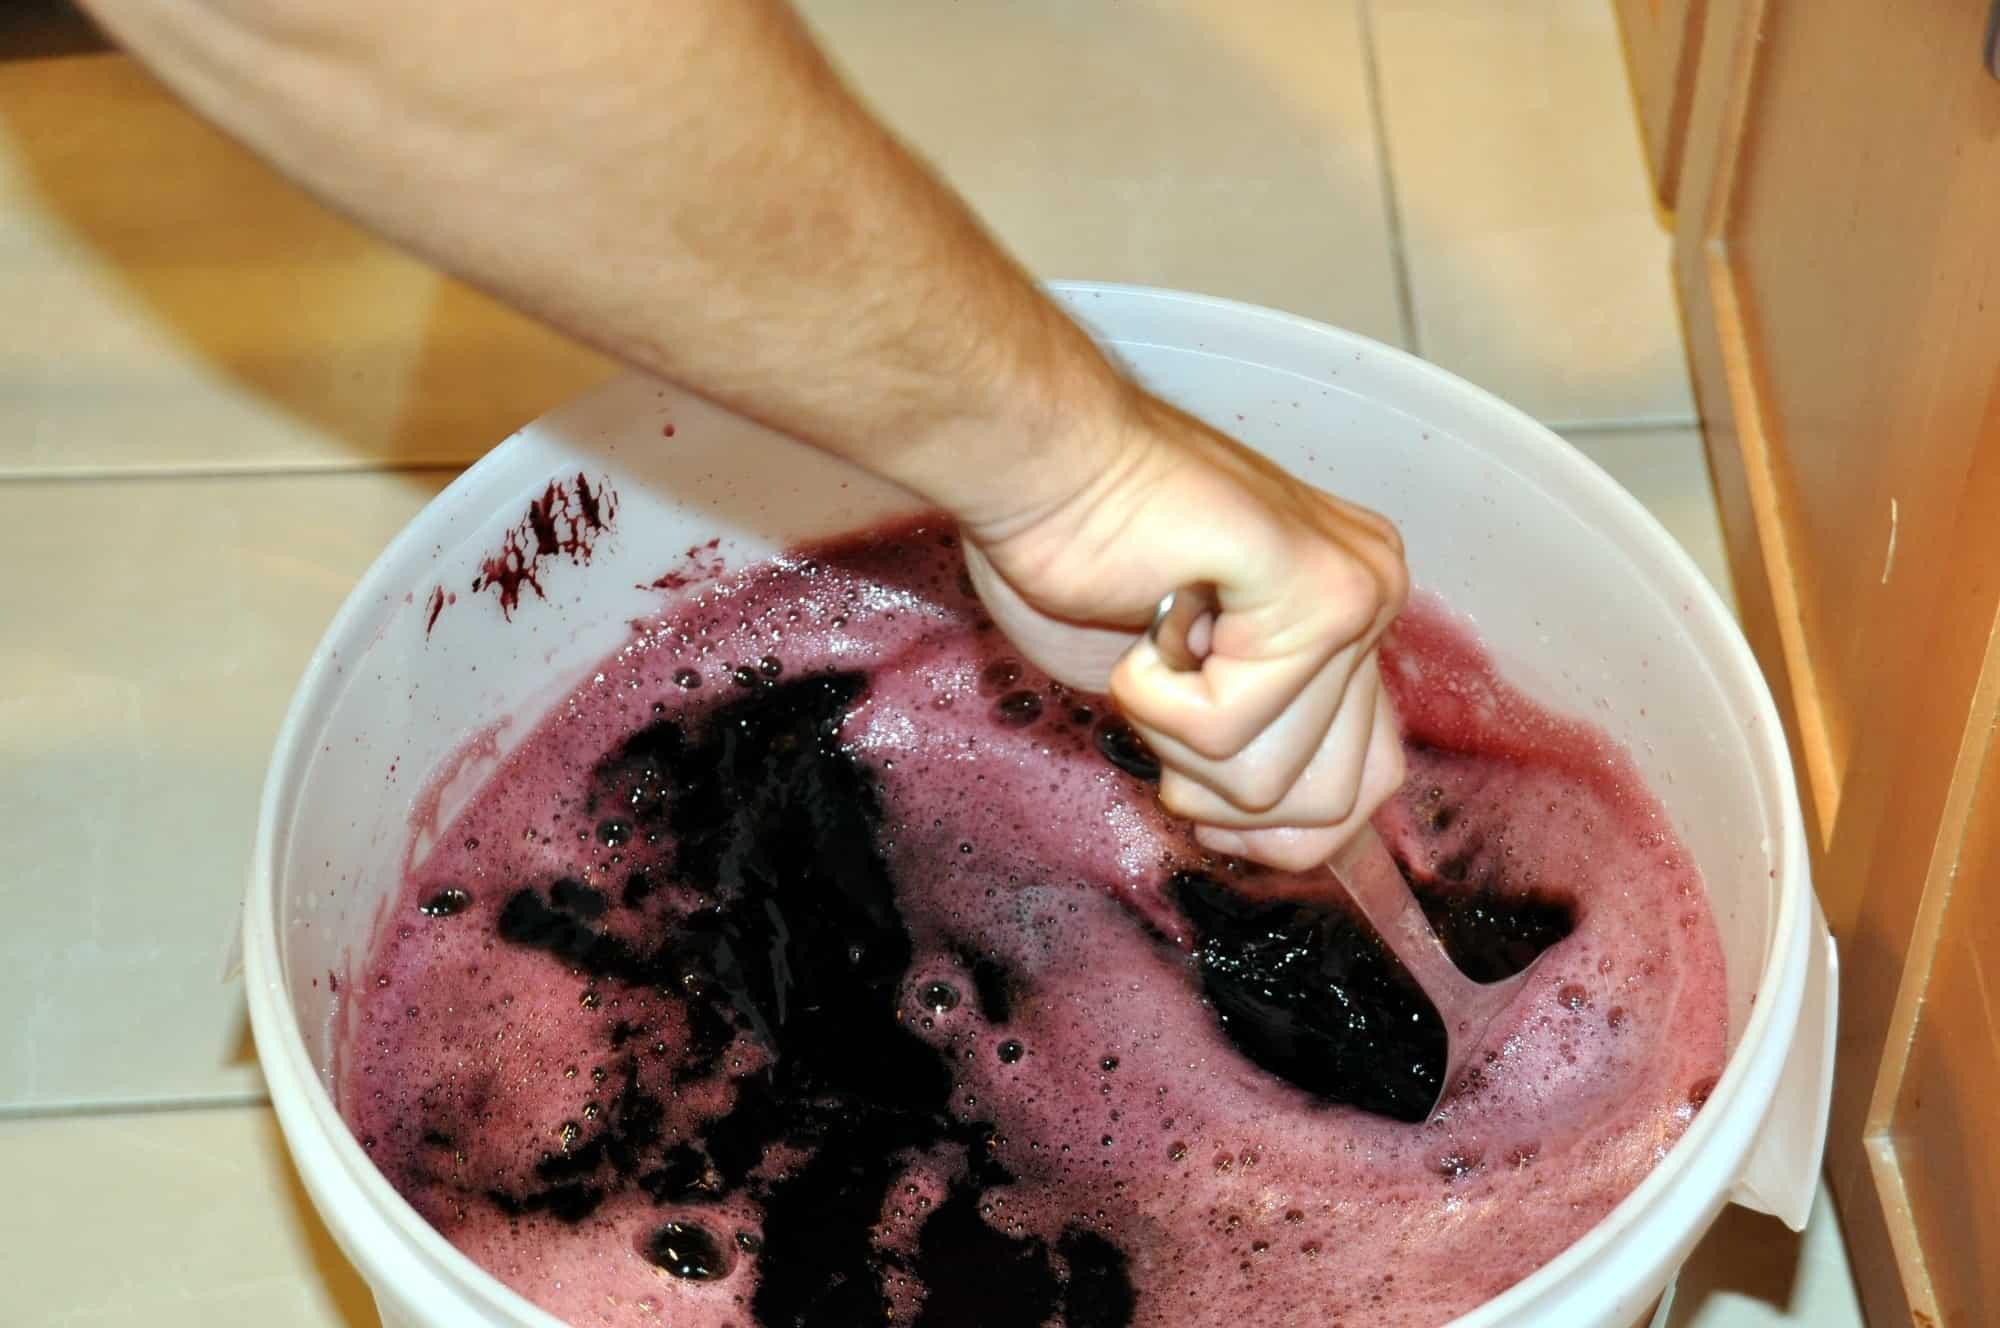 Stirring and Wine Making